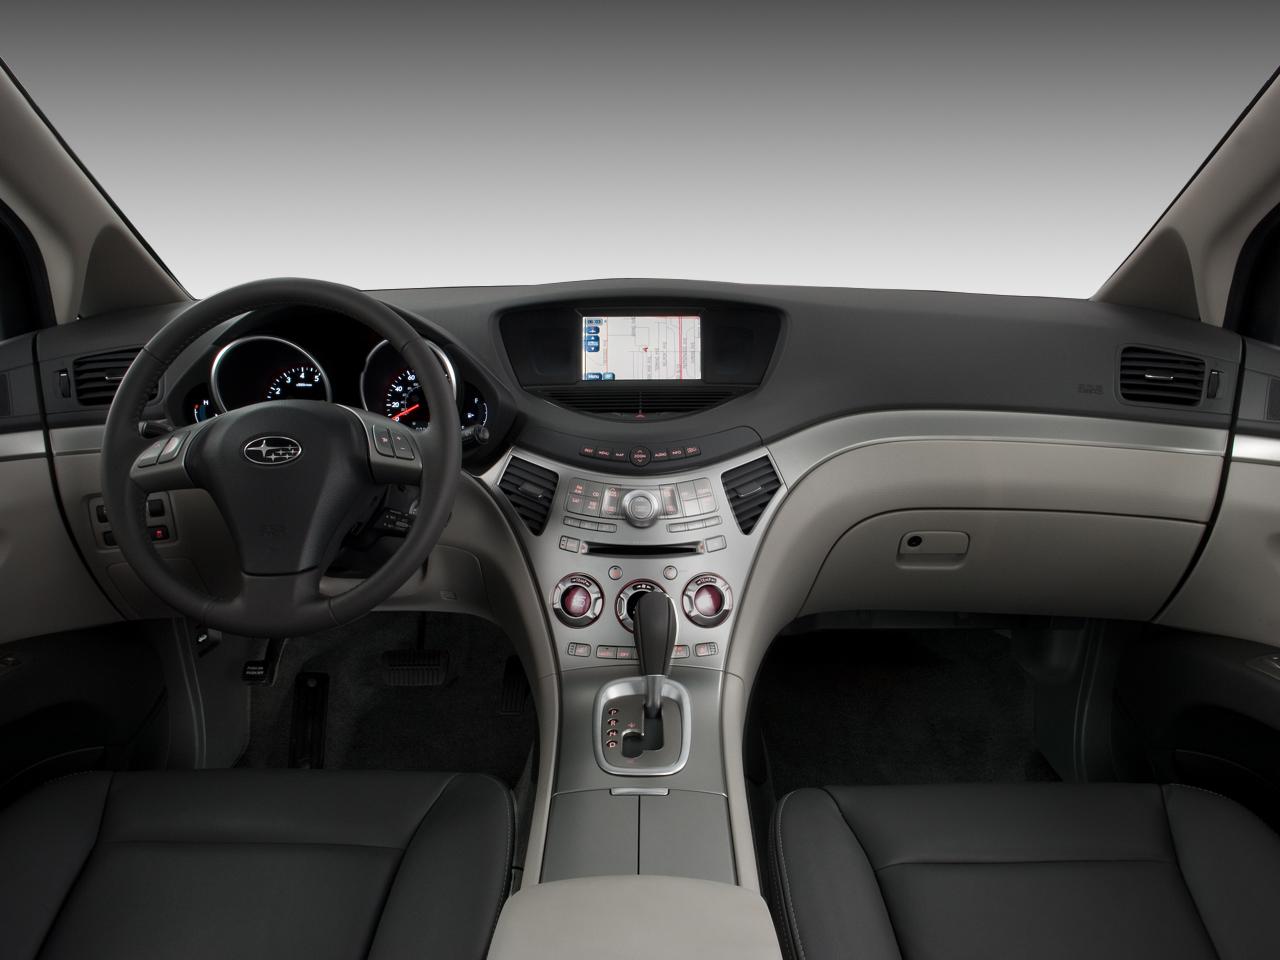 Subaru Premium 2014 >> 2009 Subaru Tribeca Limited - Subaru Crossover SUV Review - Automobile Magazine